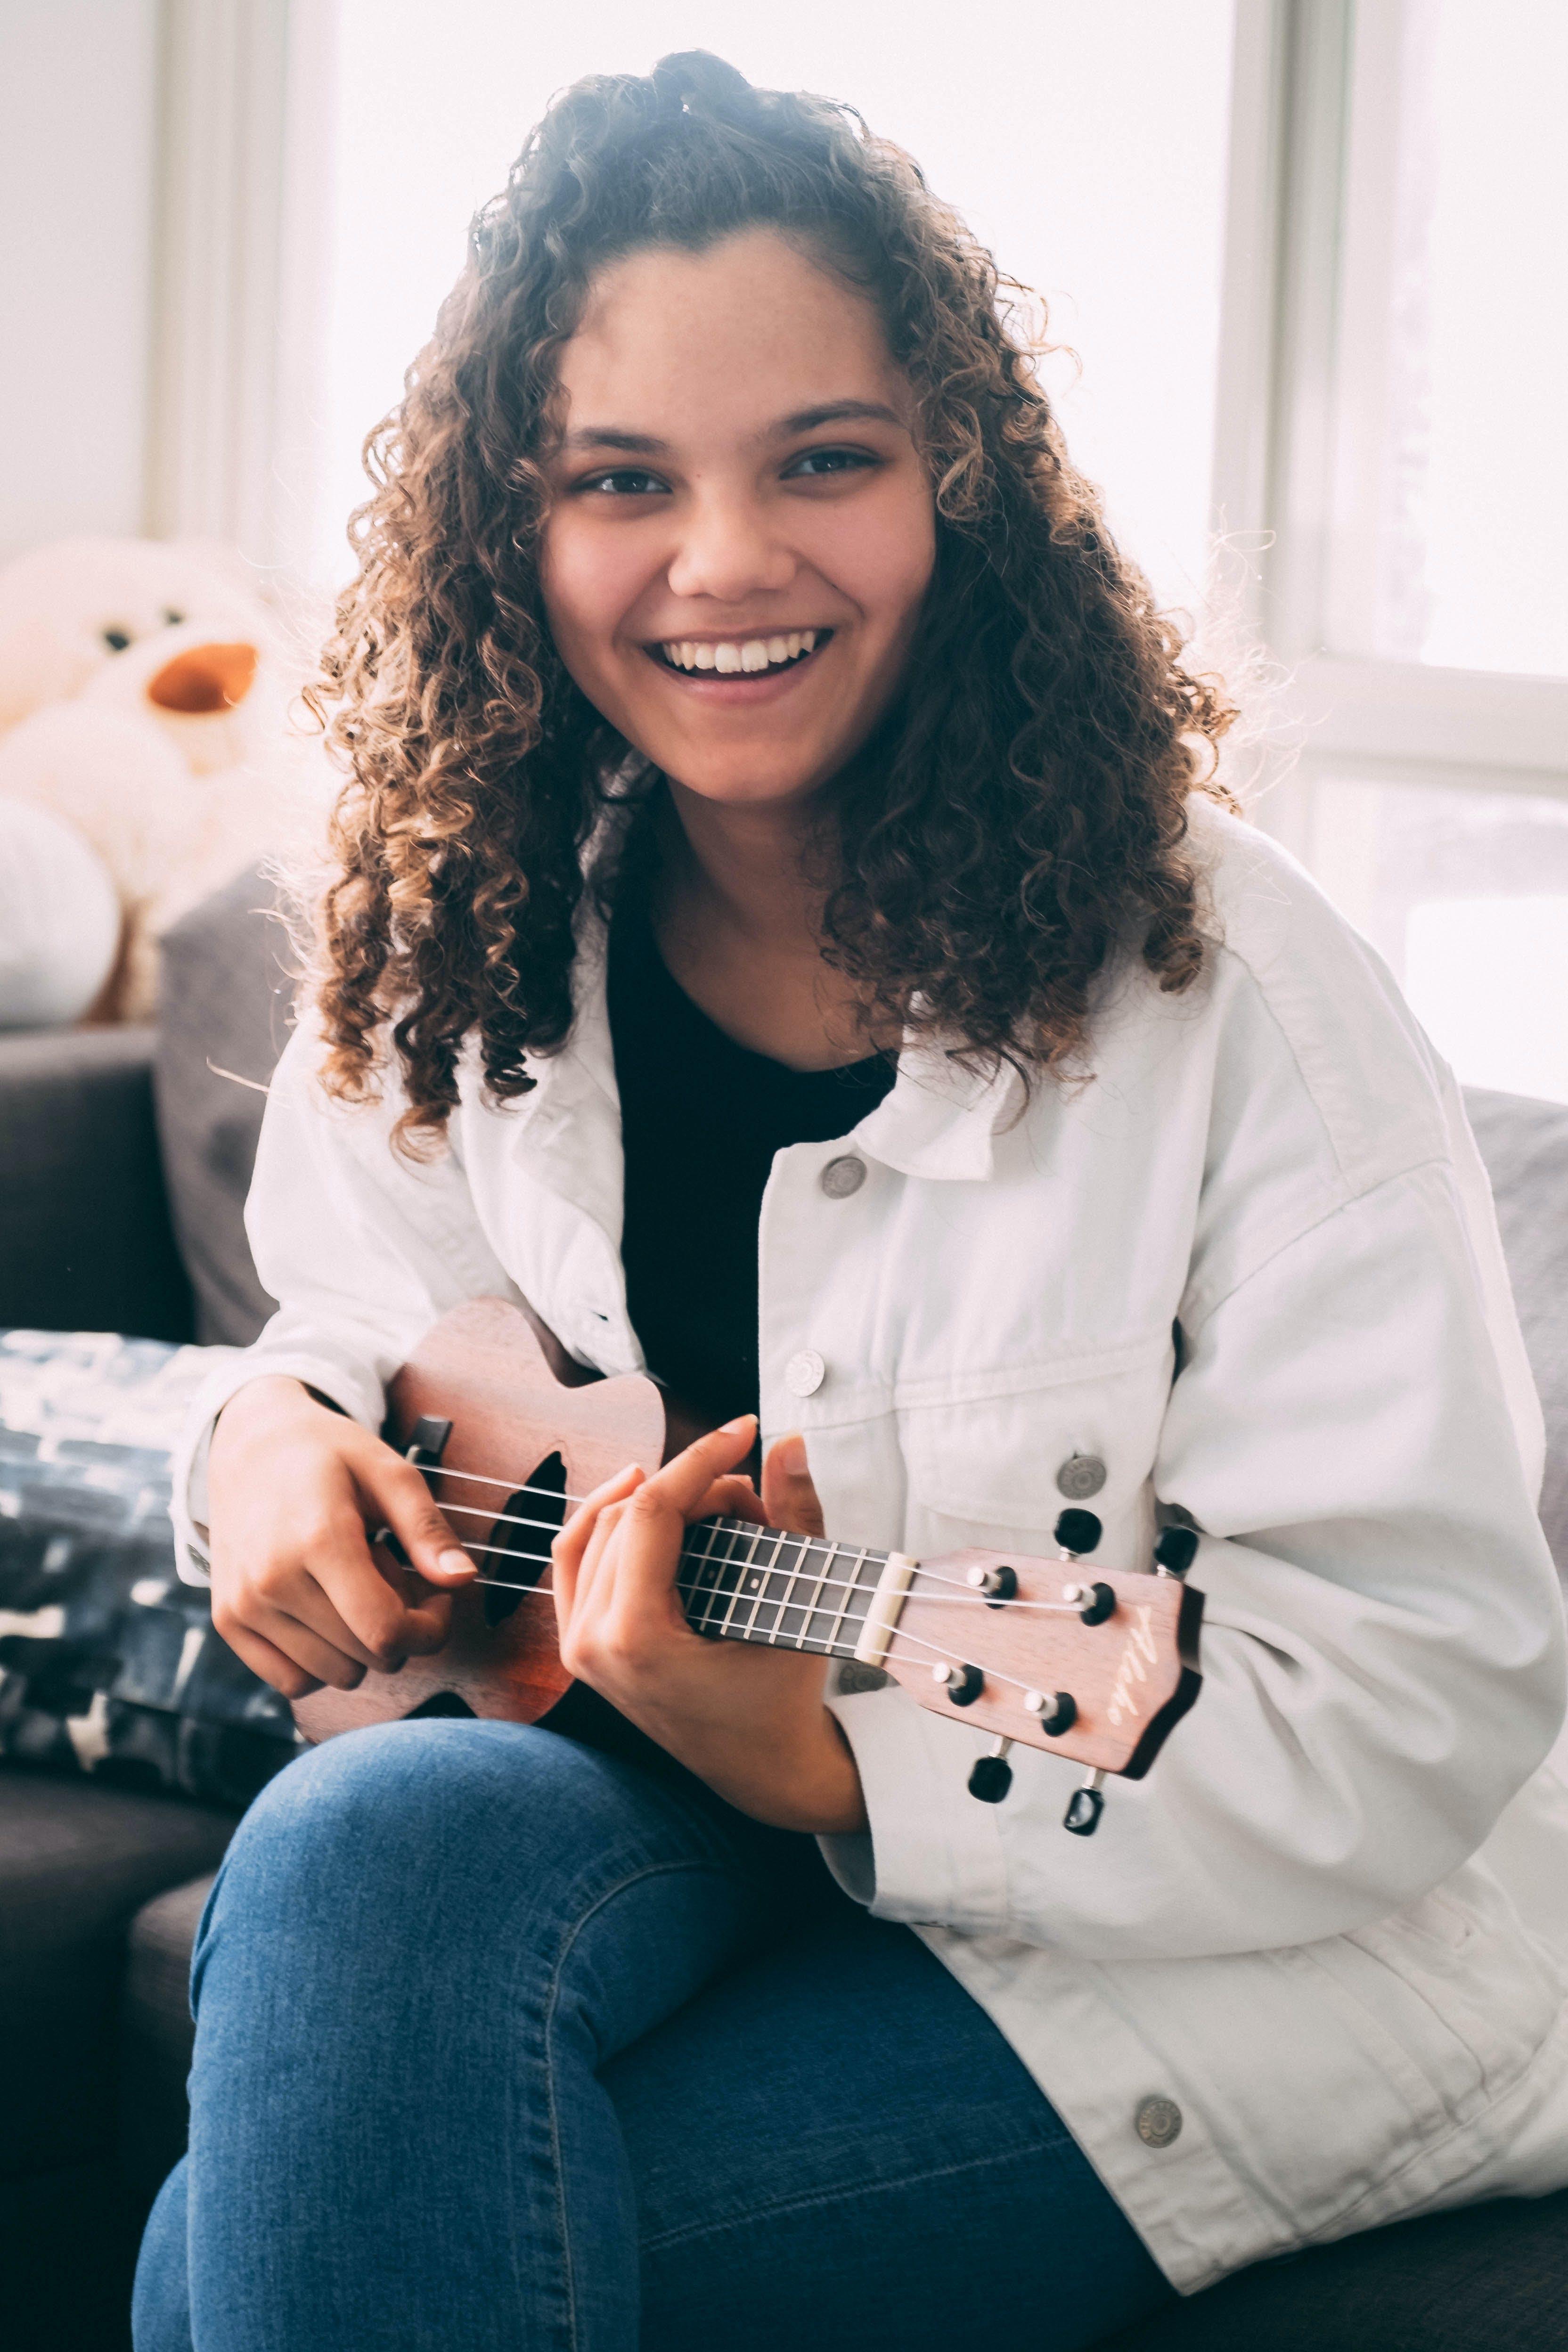 Free stock photo of curls, girl, guitar, hair